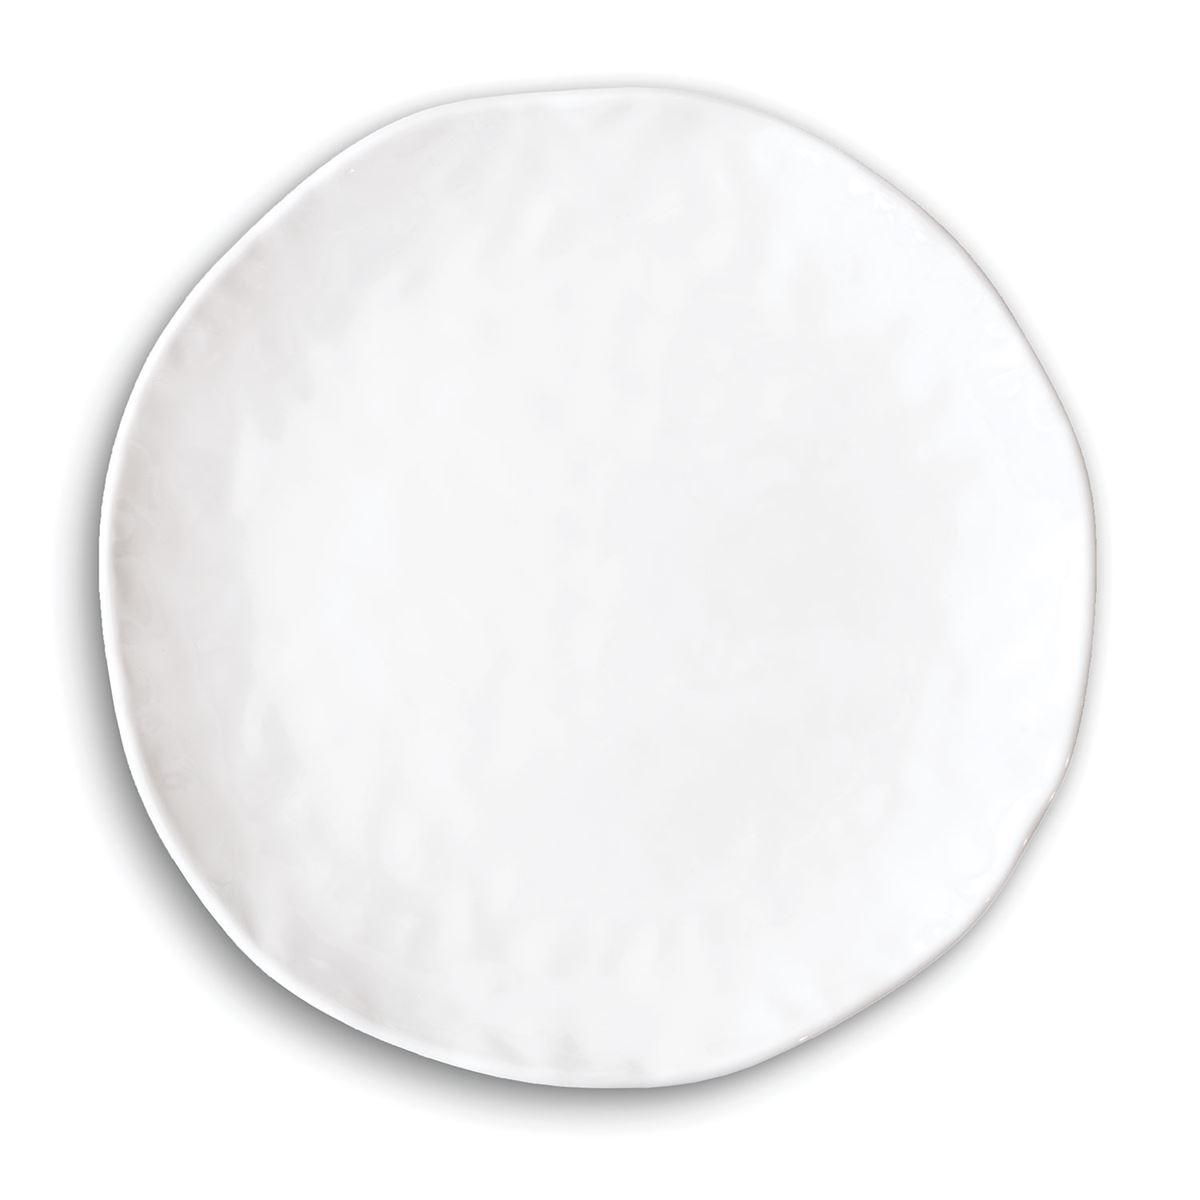 White on White Melamine Casual Dinner Plate ...  sc 1 st  Ferris Wheels and Carousels & Michel Design Works Melamine Casual Dinner Plate - White on White